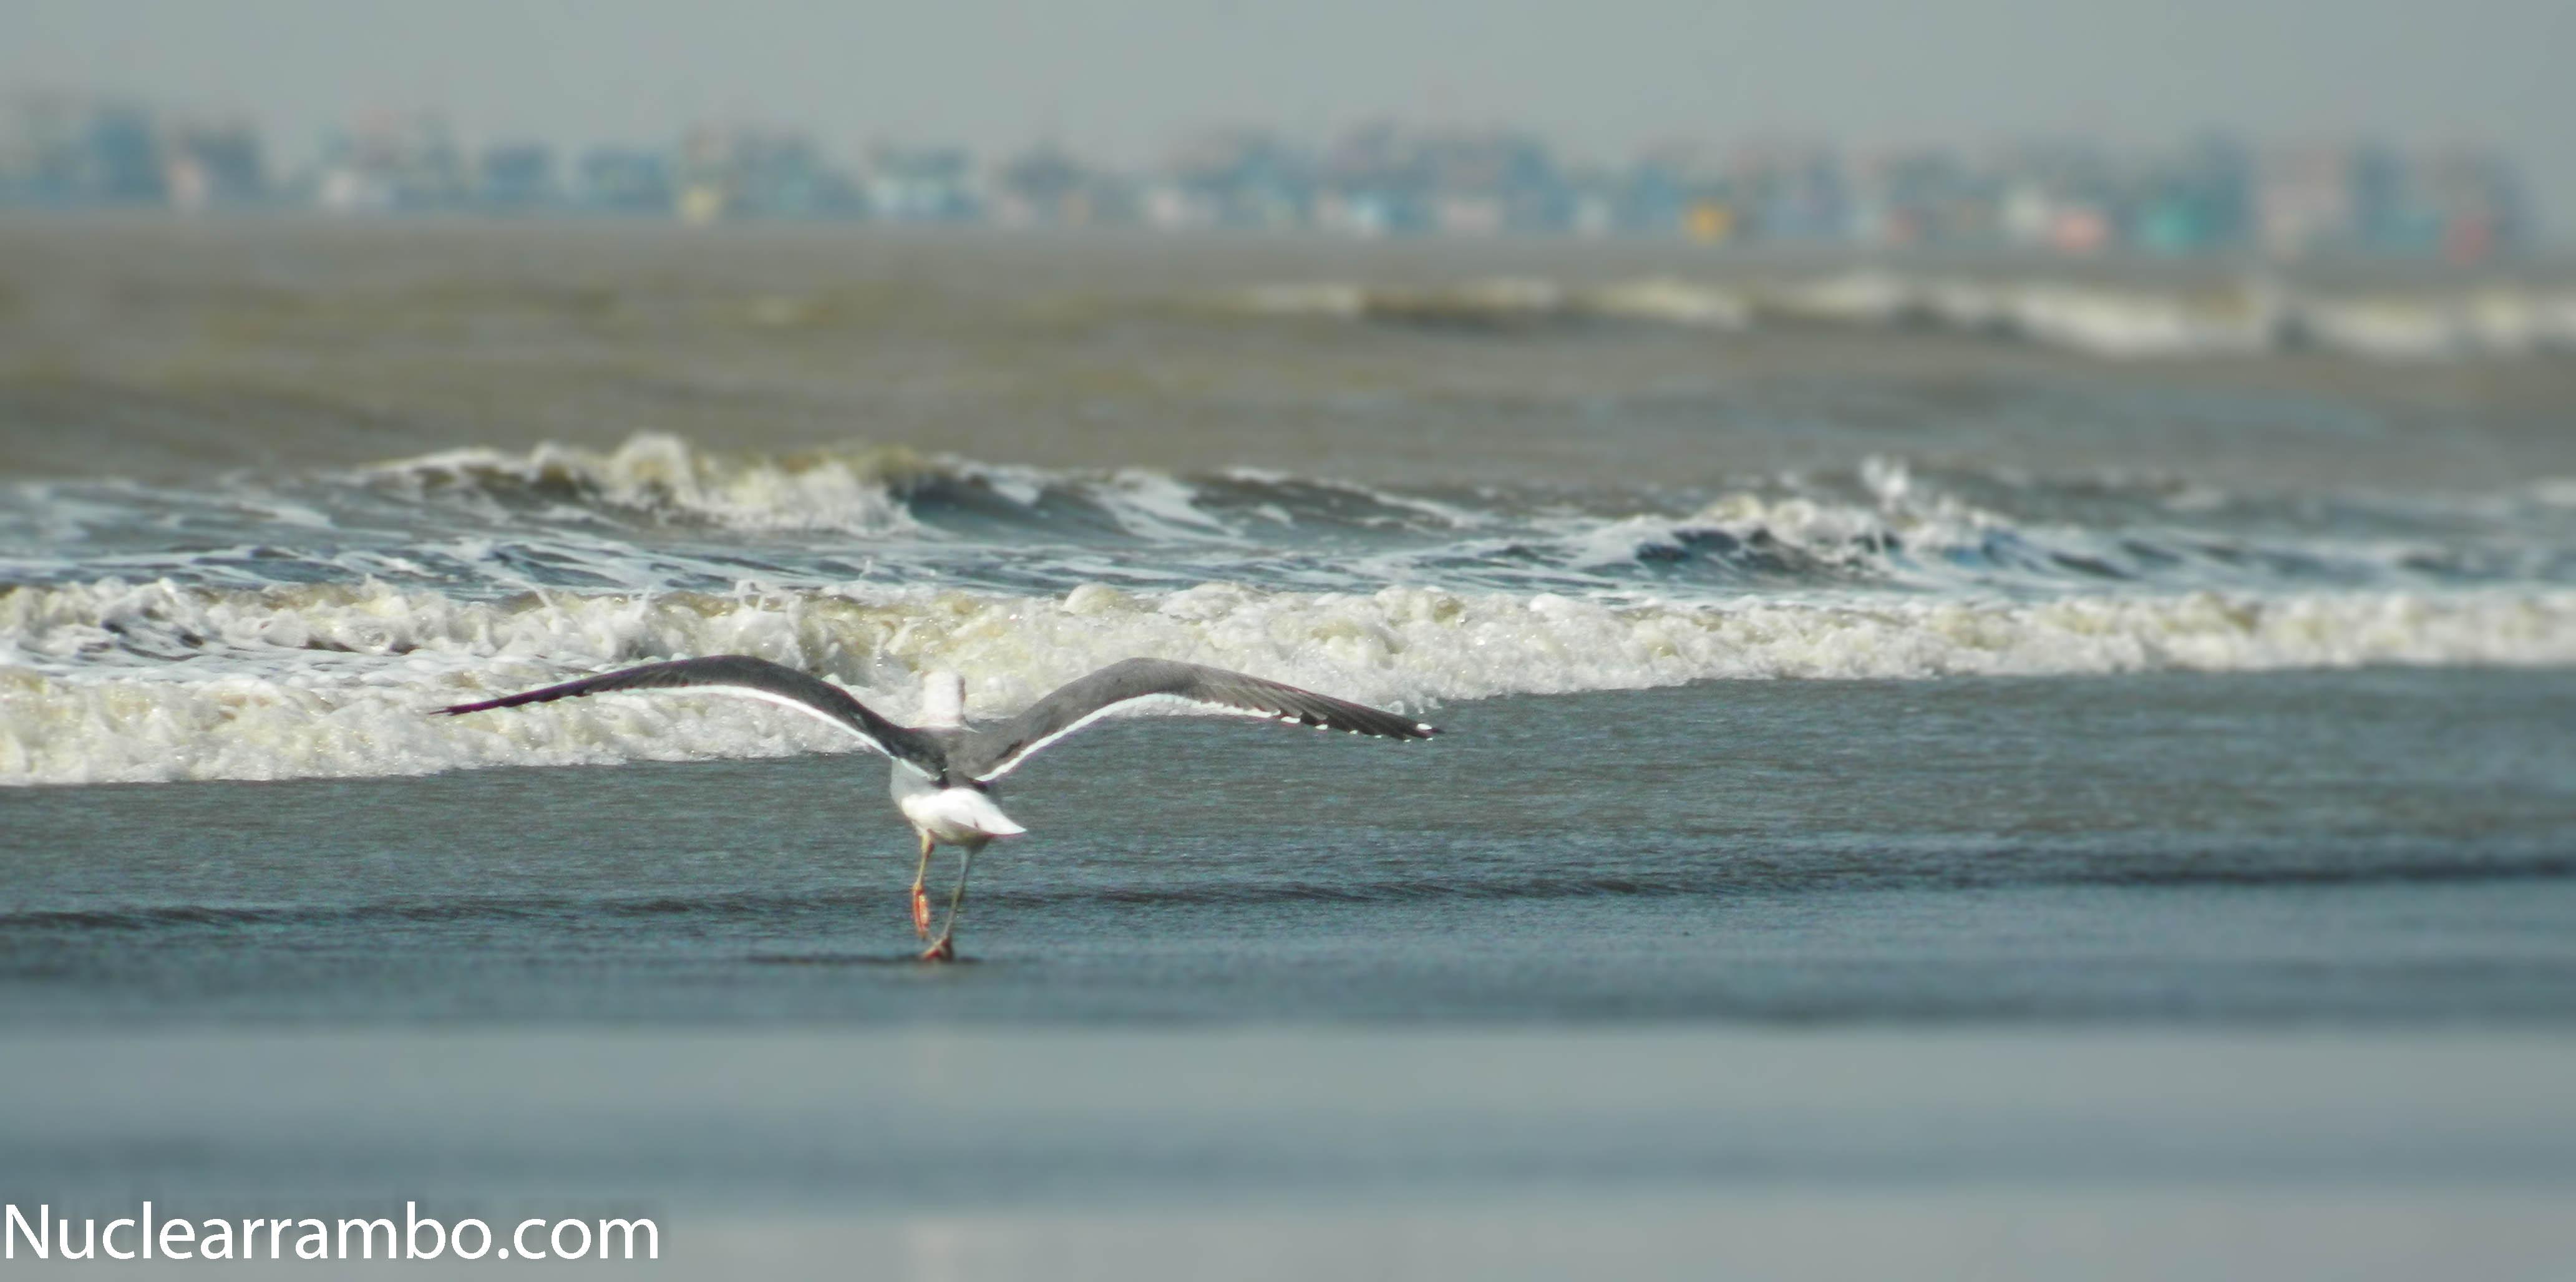 Sea gull on arnala beach